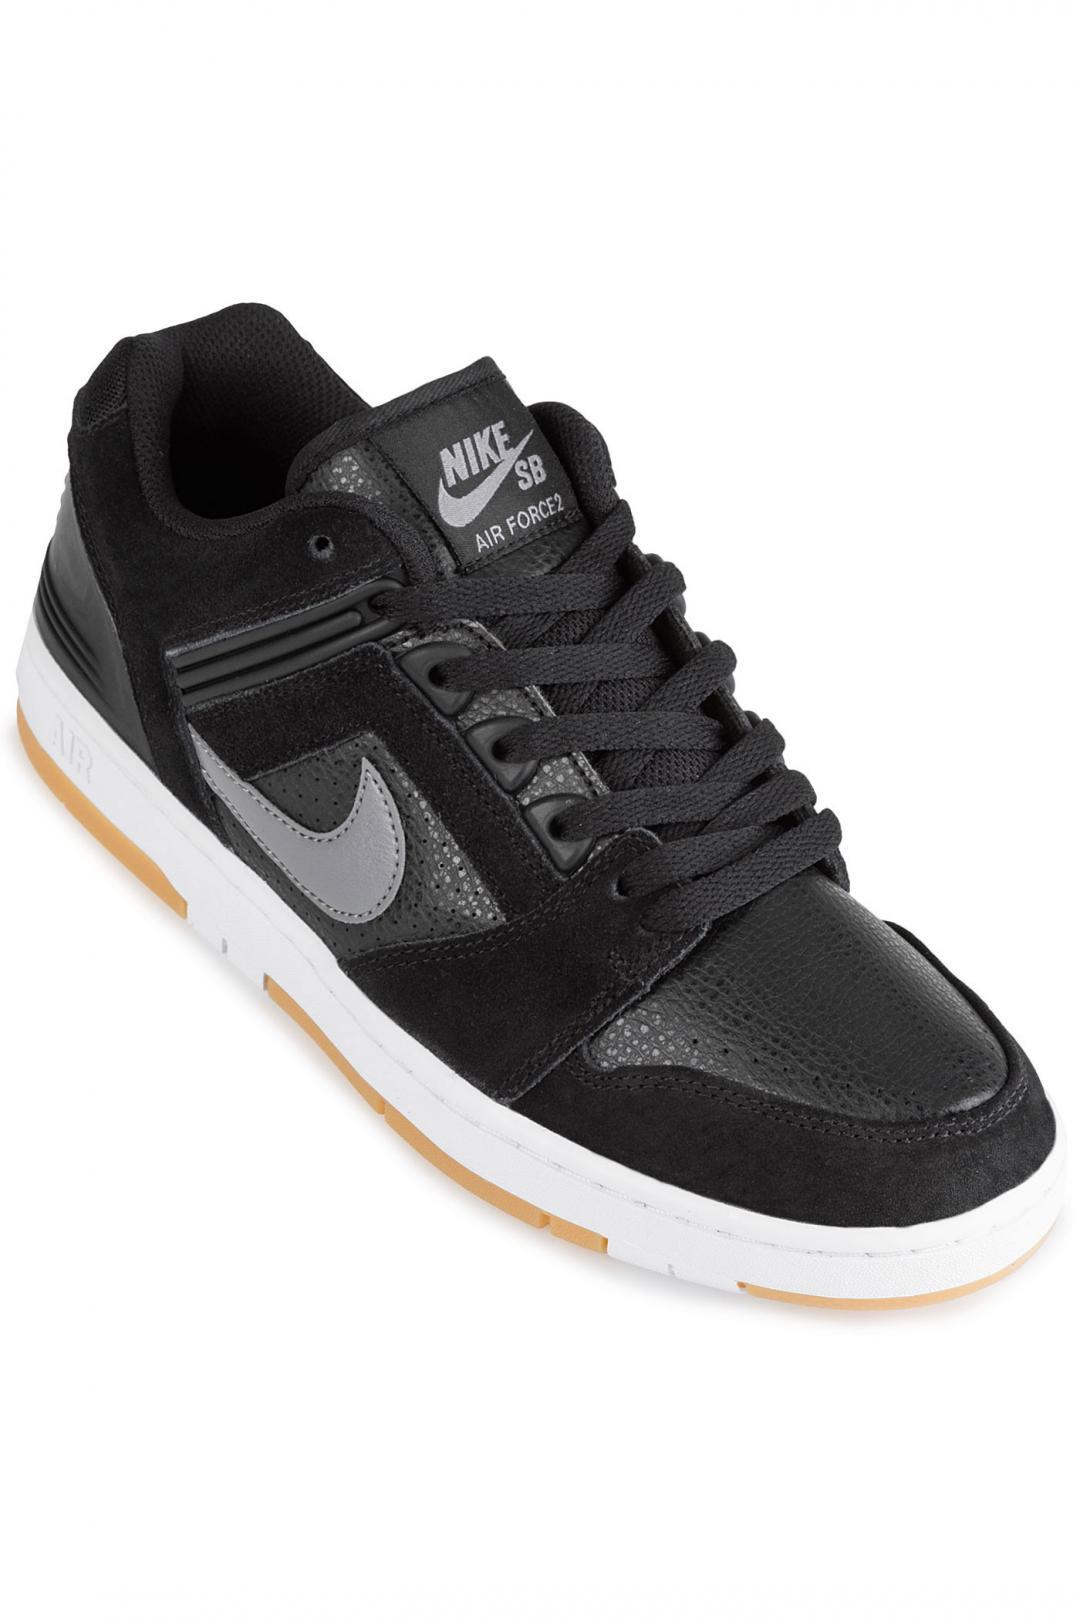 Uomo Nike SB Air Force II Low black gunsmoke | Sneaker